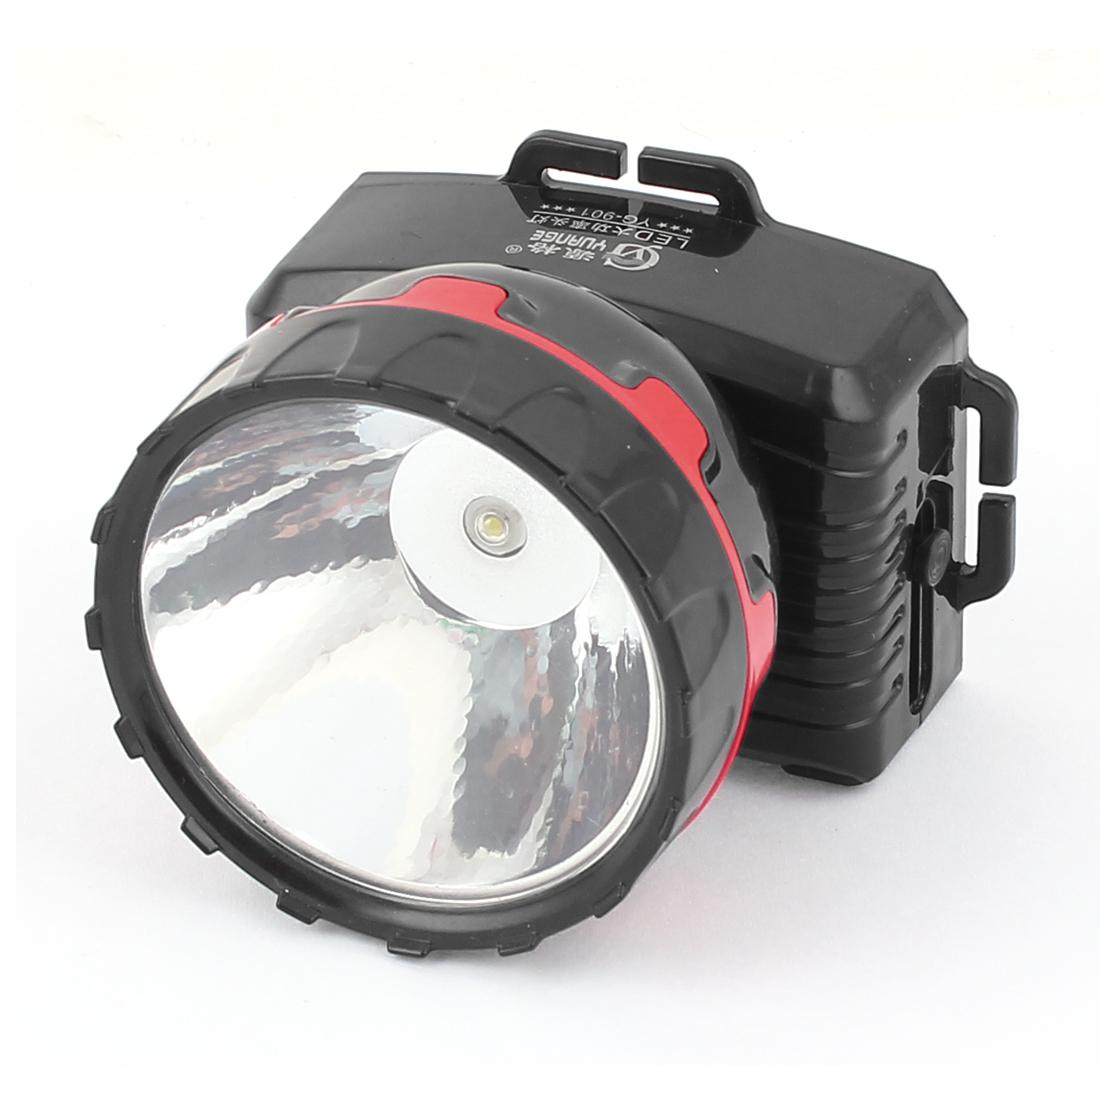 AC 110-240V LED Charge EU Plug Camping Head Torch Headlight Headlamp